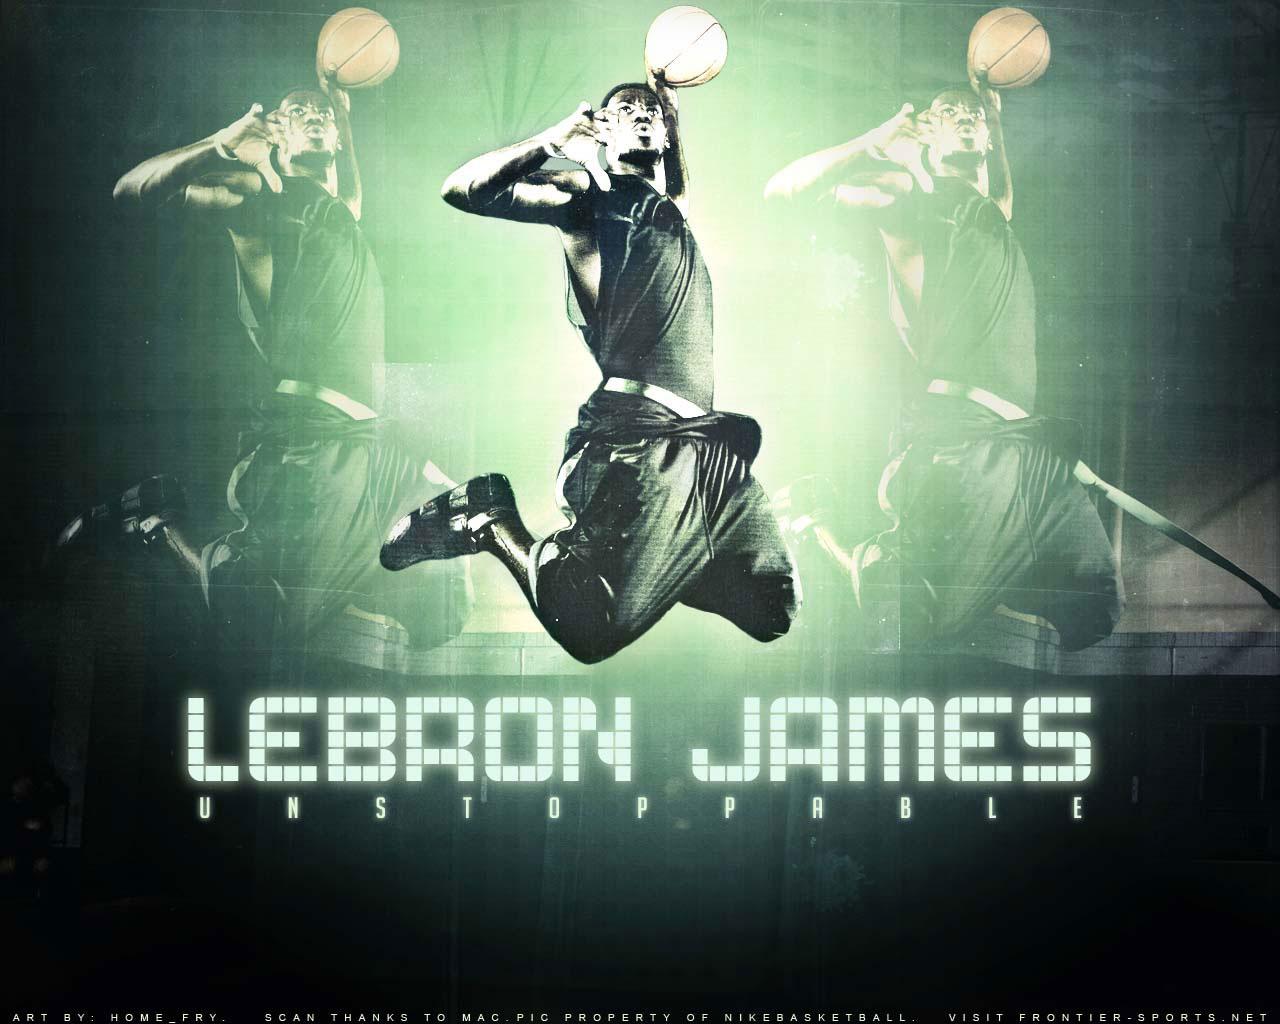 LeBron James Dunk Wall...